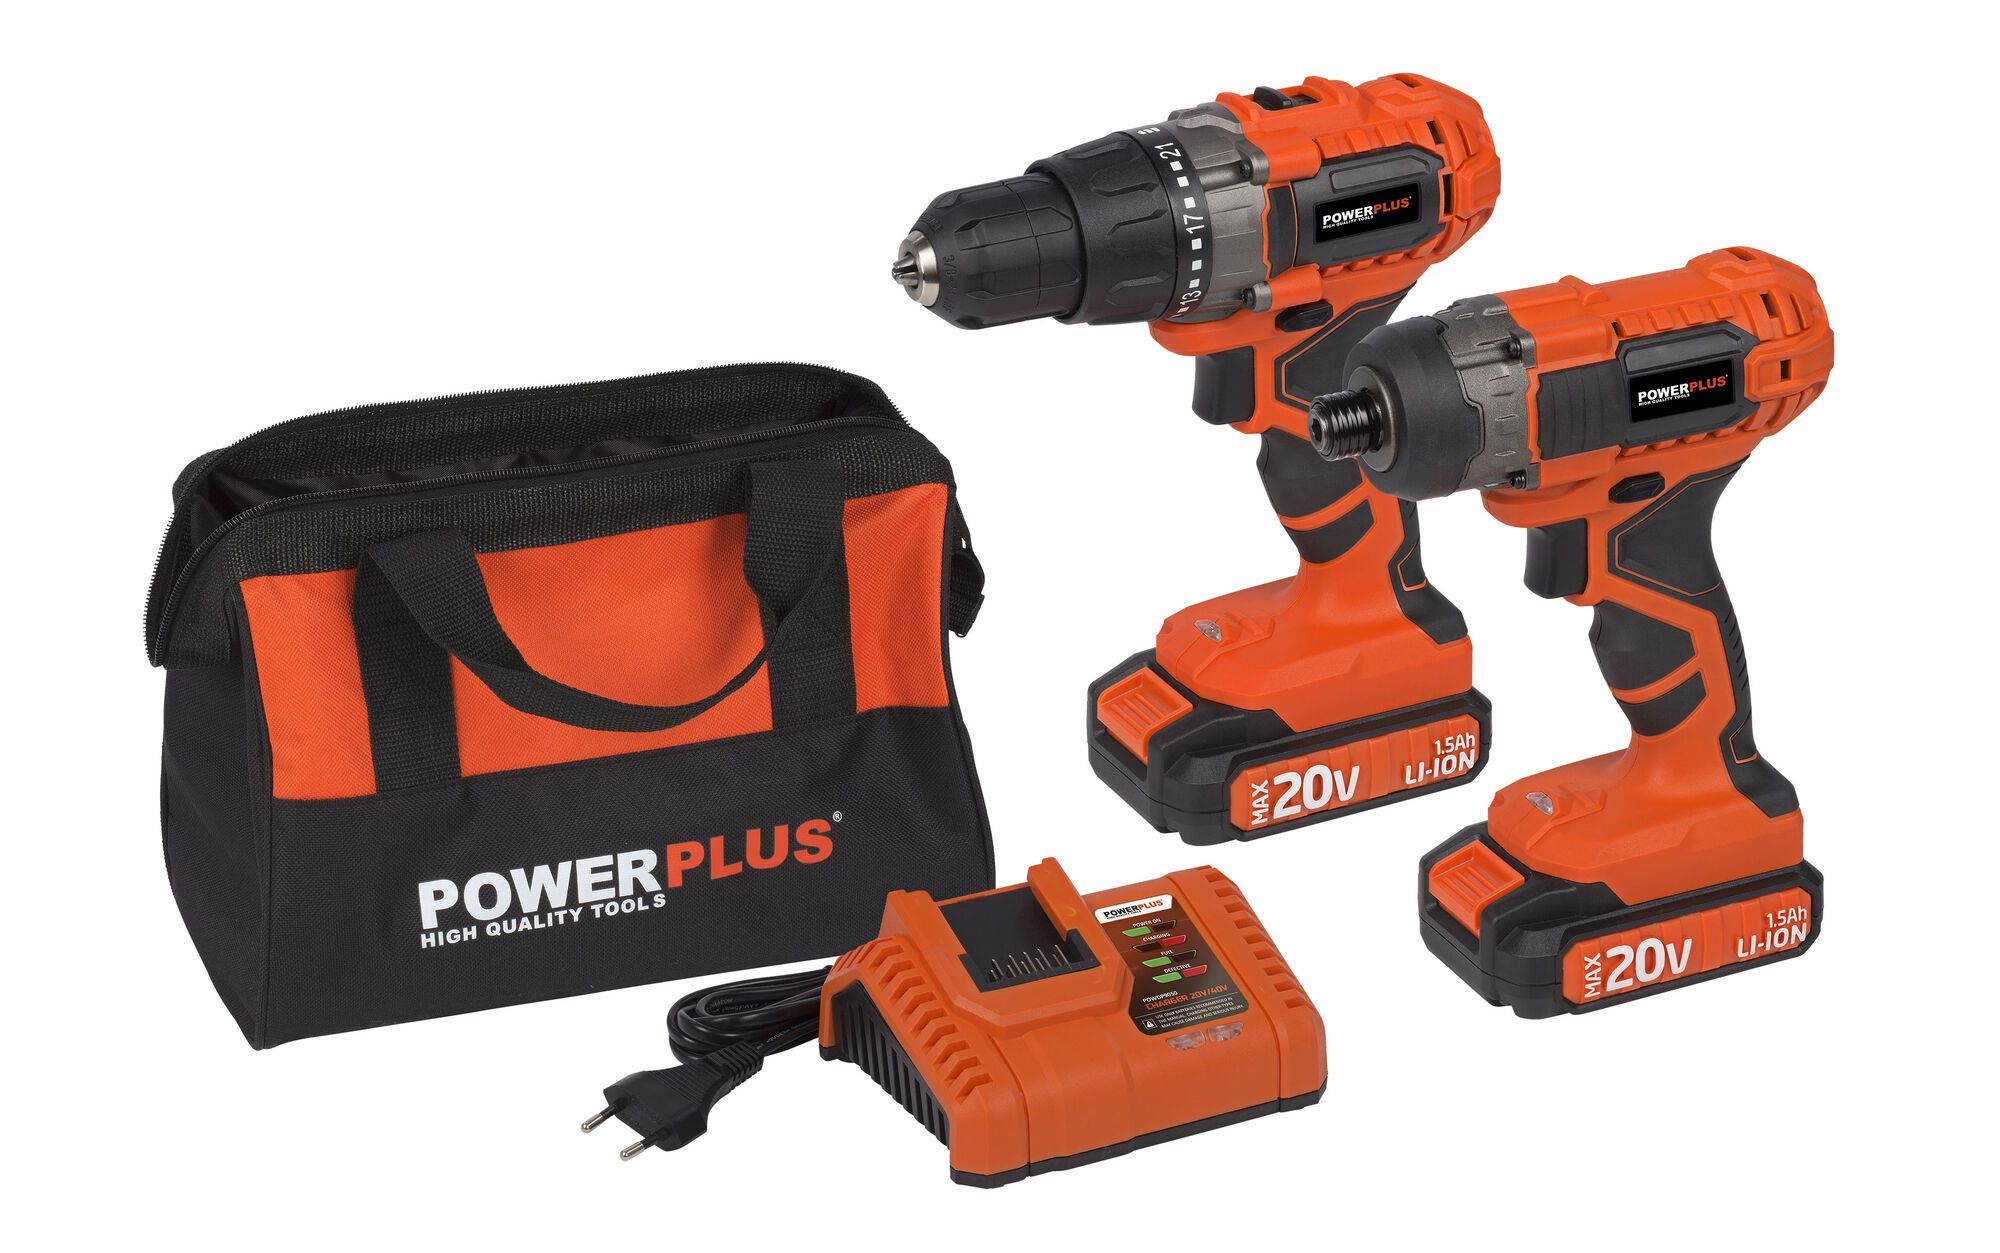 Powerplus POWDP1550 Slagschroevendraaier + Accuboormachine | Inclusief 2 Accu's + Lader + Opbergtas